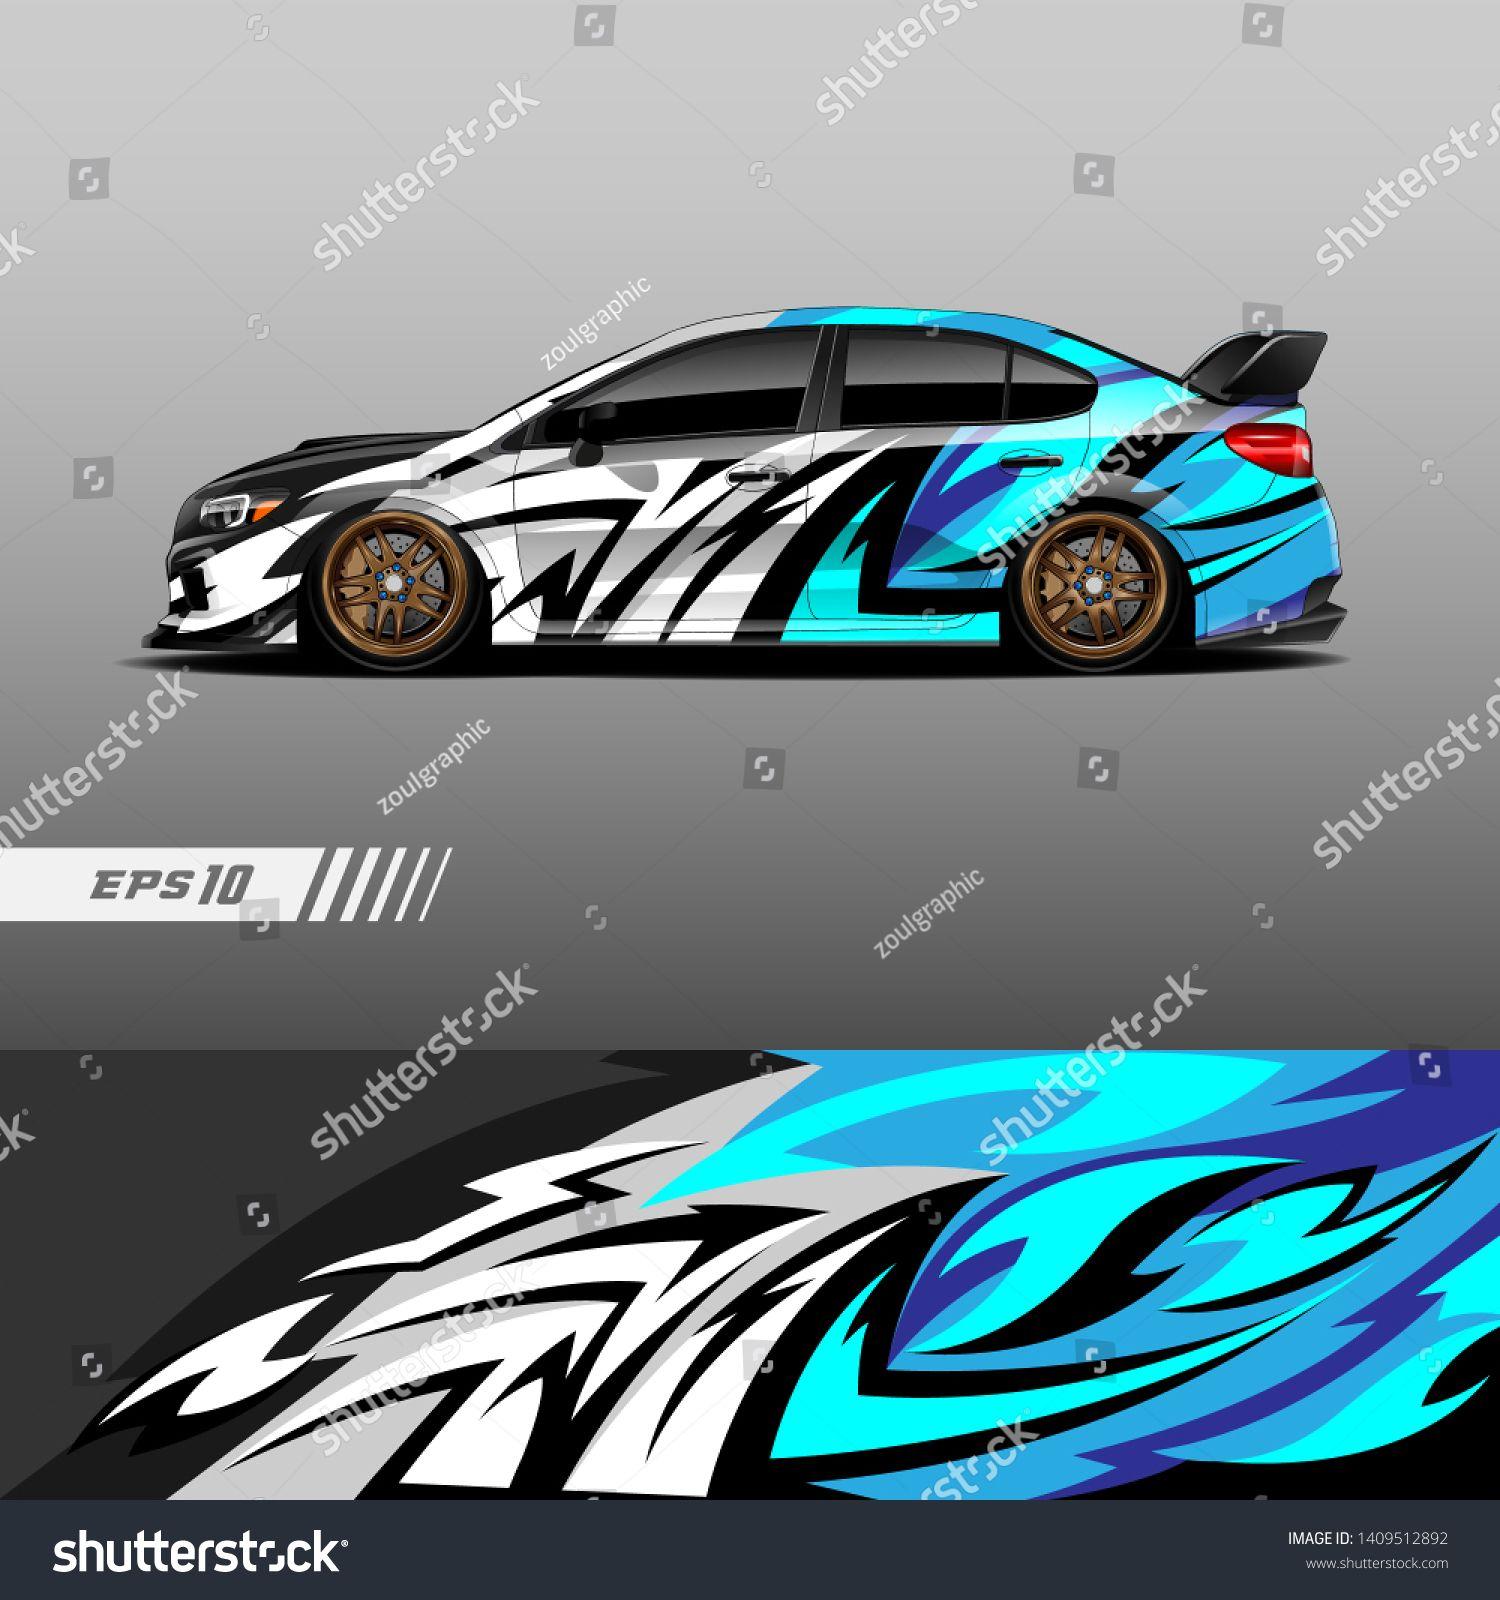 Car Decal Wrap Design Vector Graphic Stock Vector (Royalty Free) 1409512892